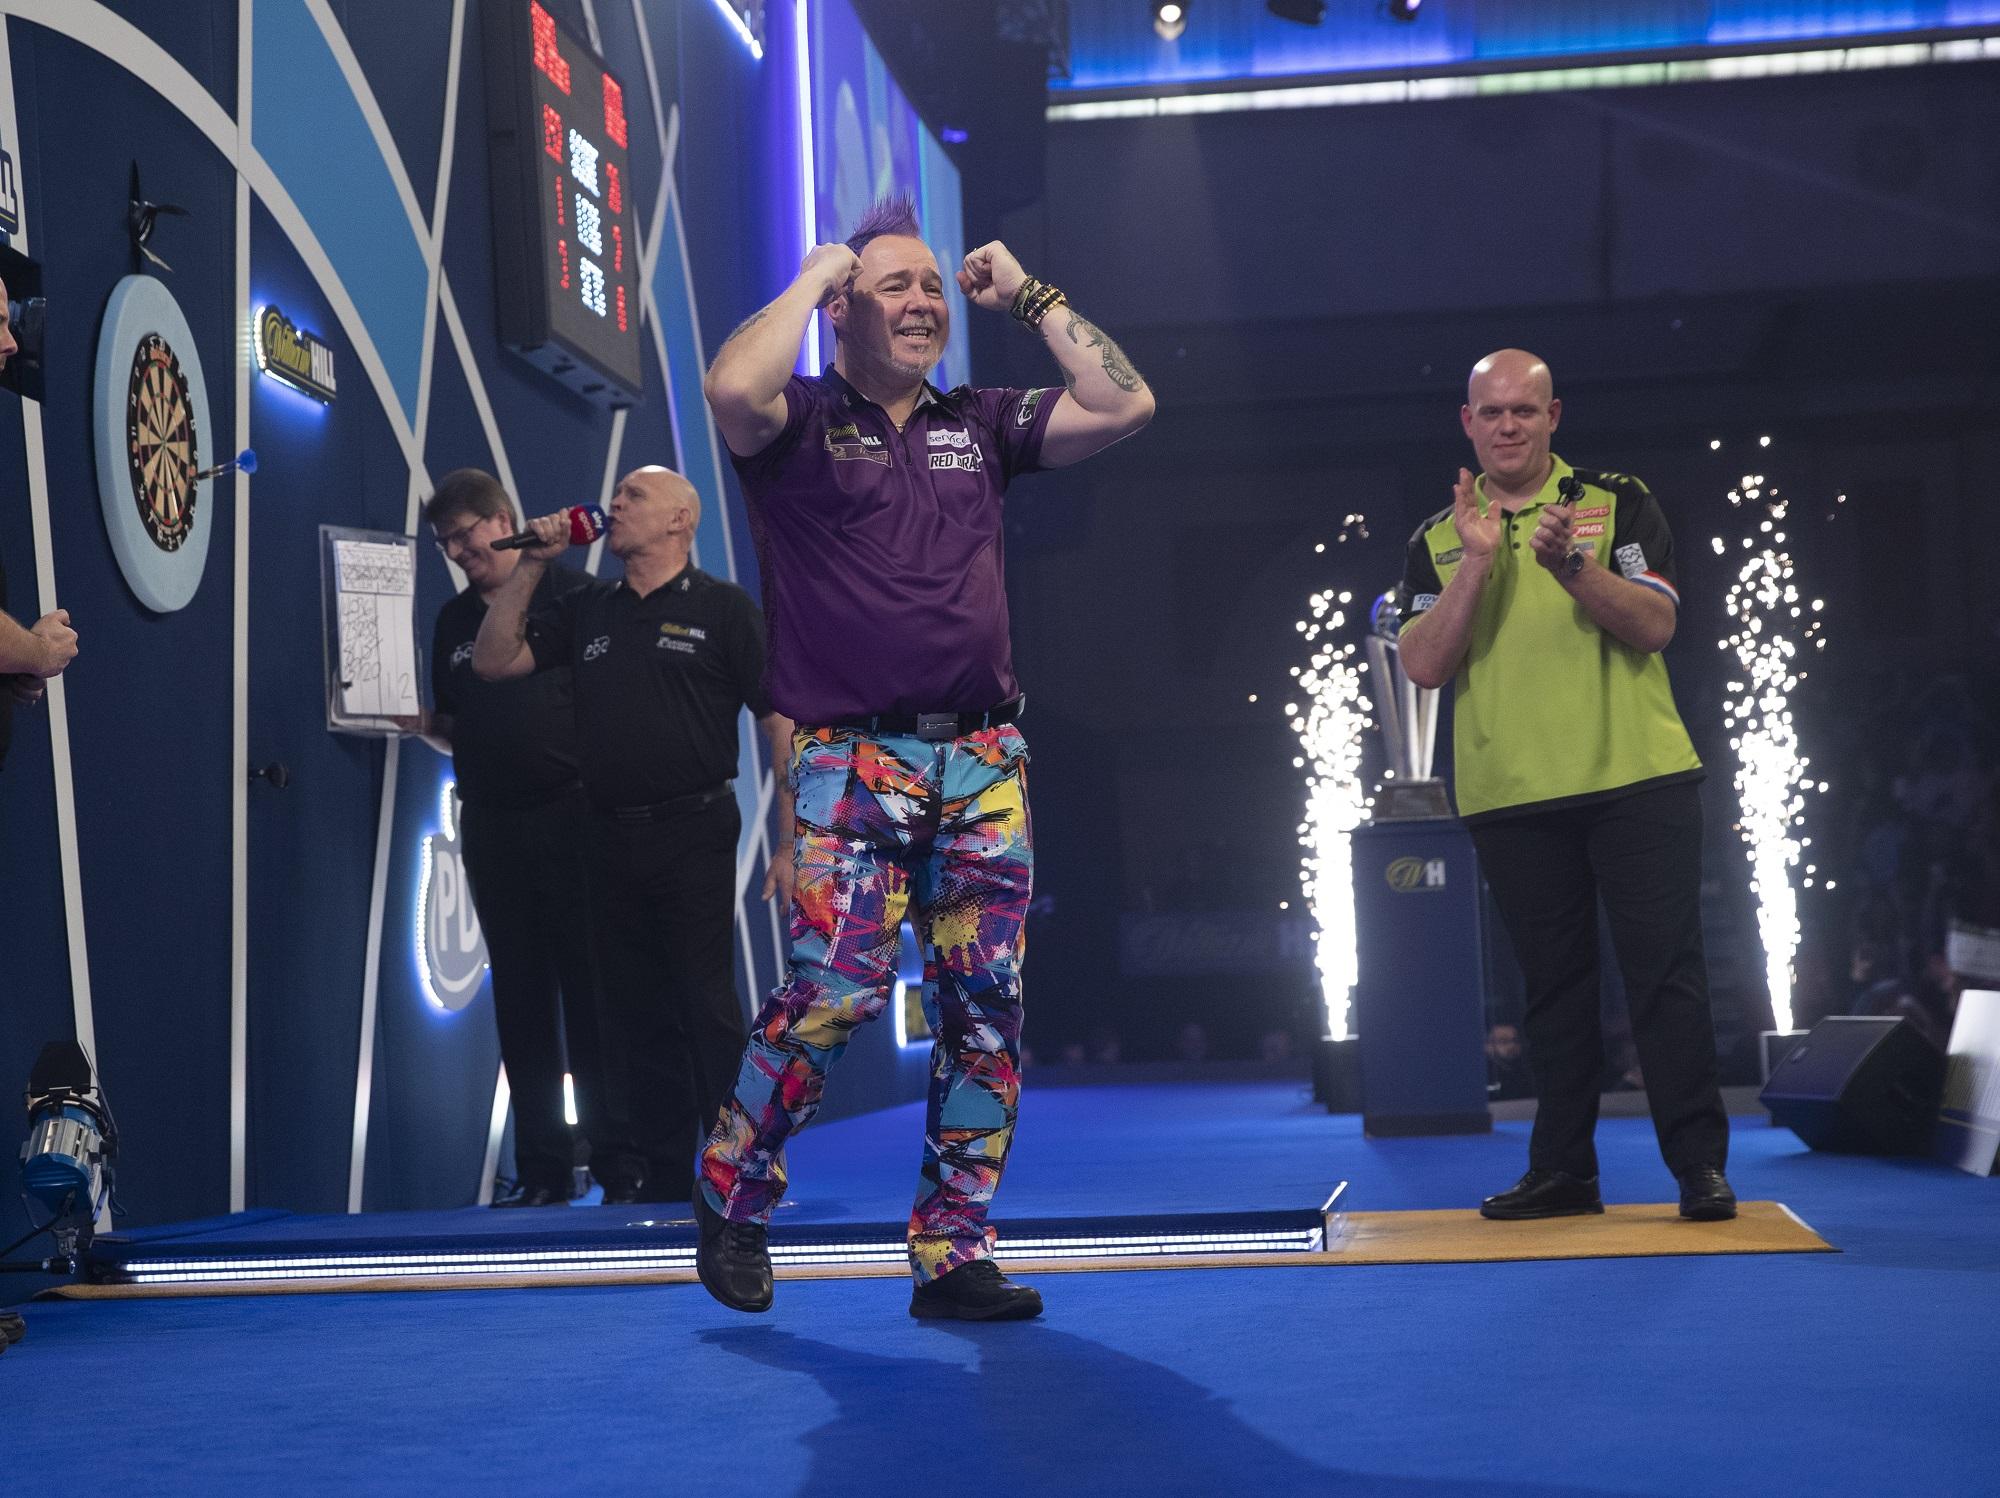 World Darts Championship Schedule Released